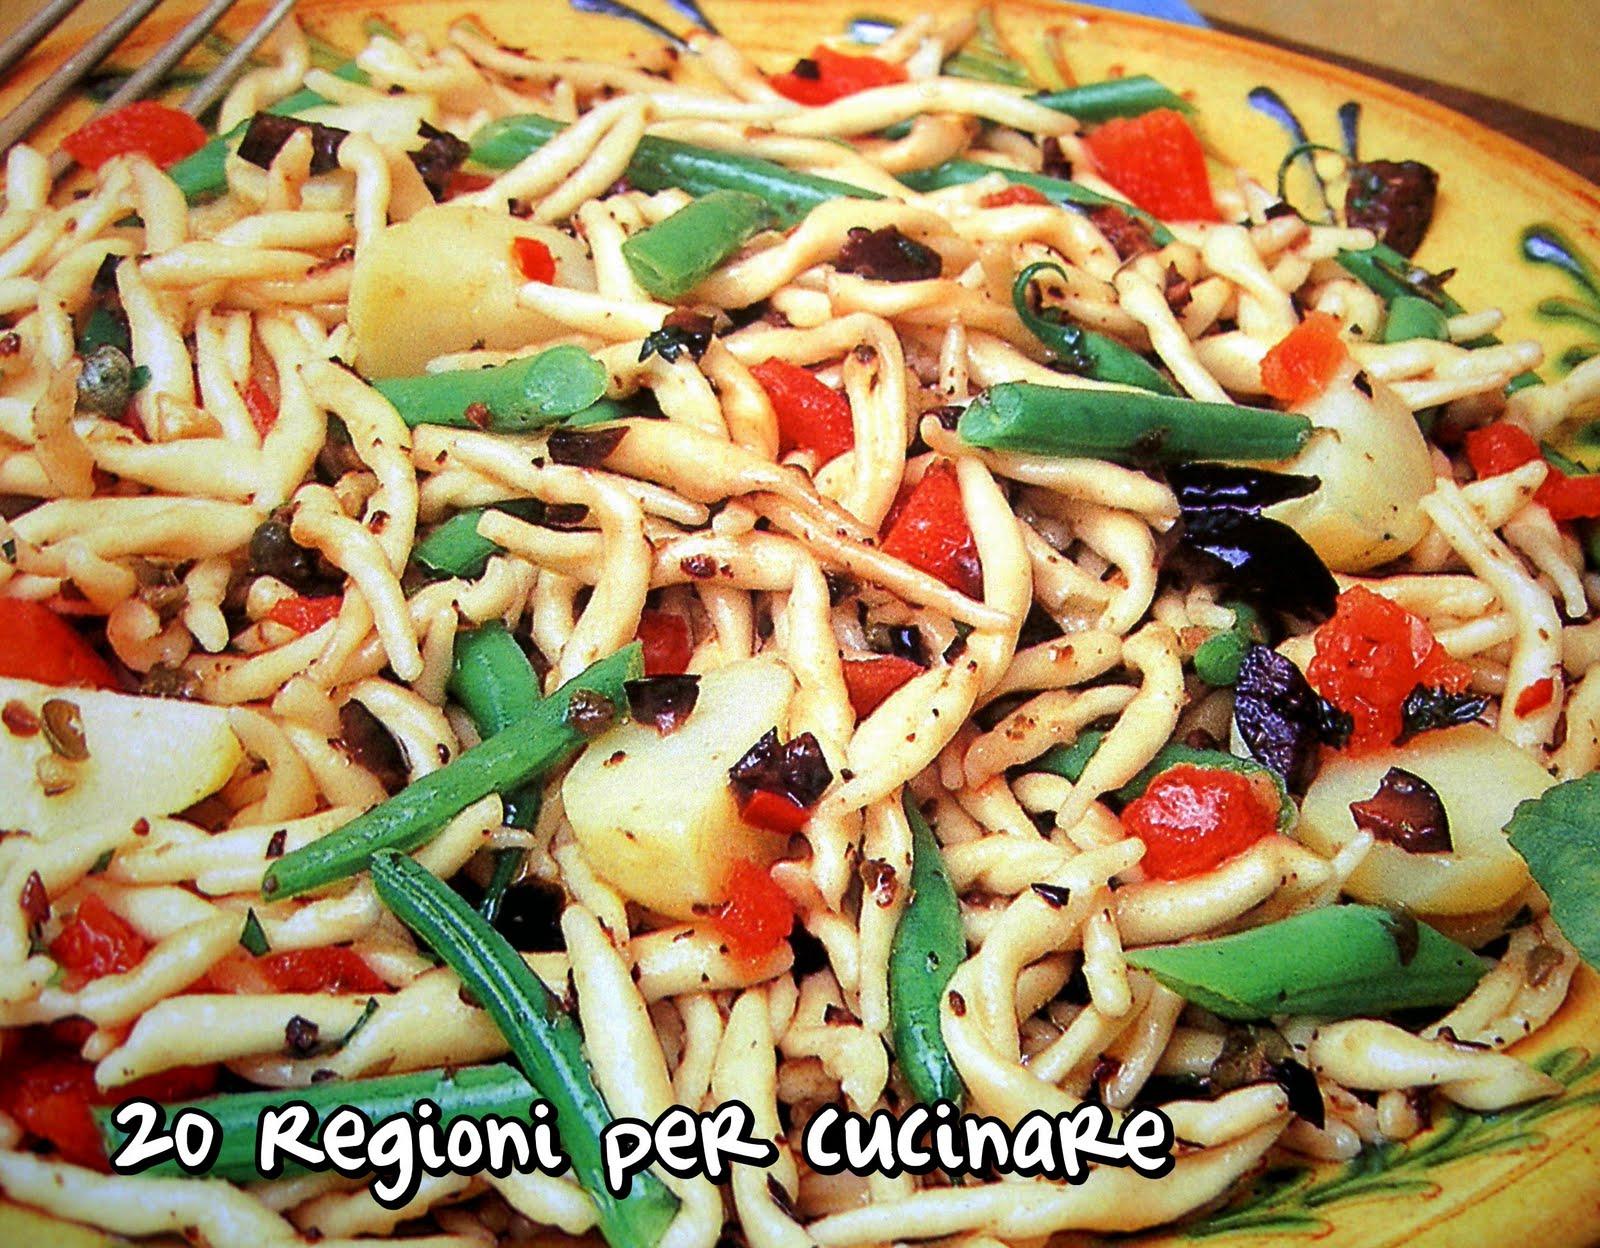 20 regioni per cucinare trofie piccantine for Cucinare per 20 persone